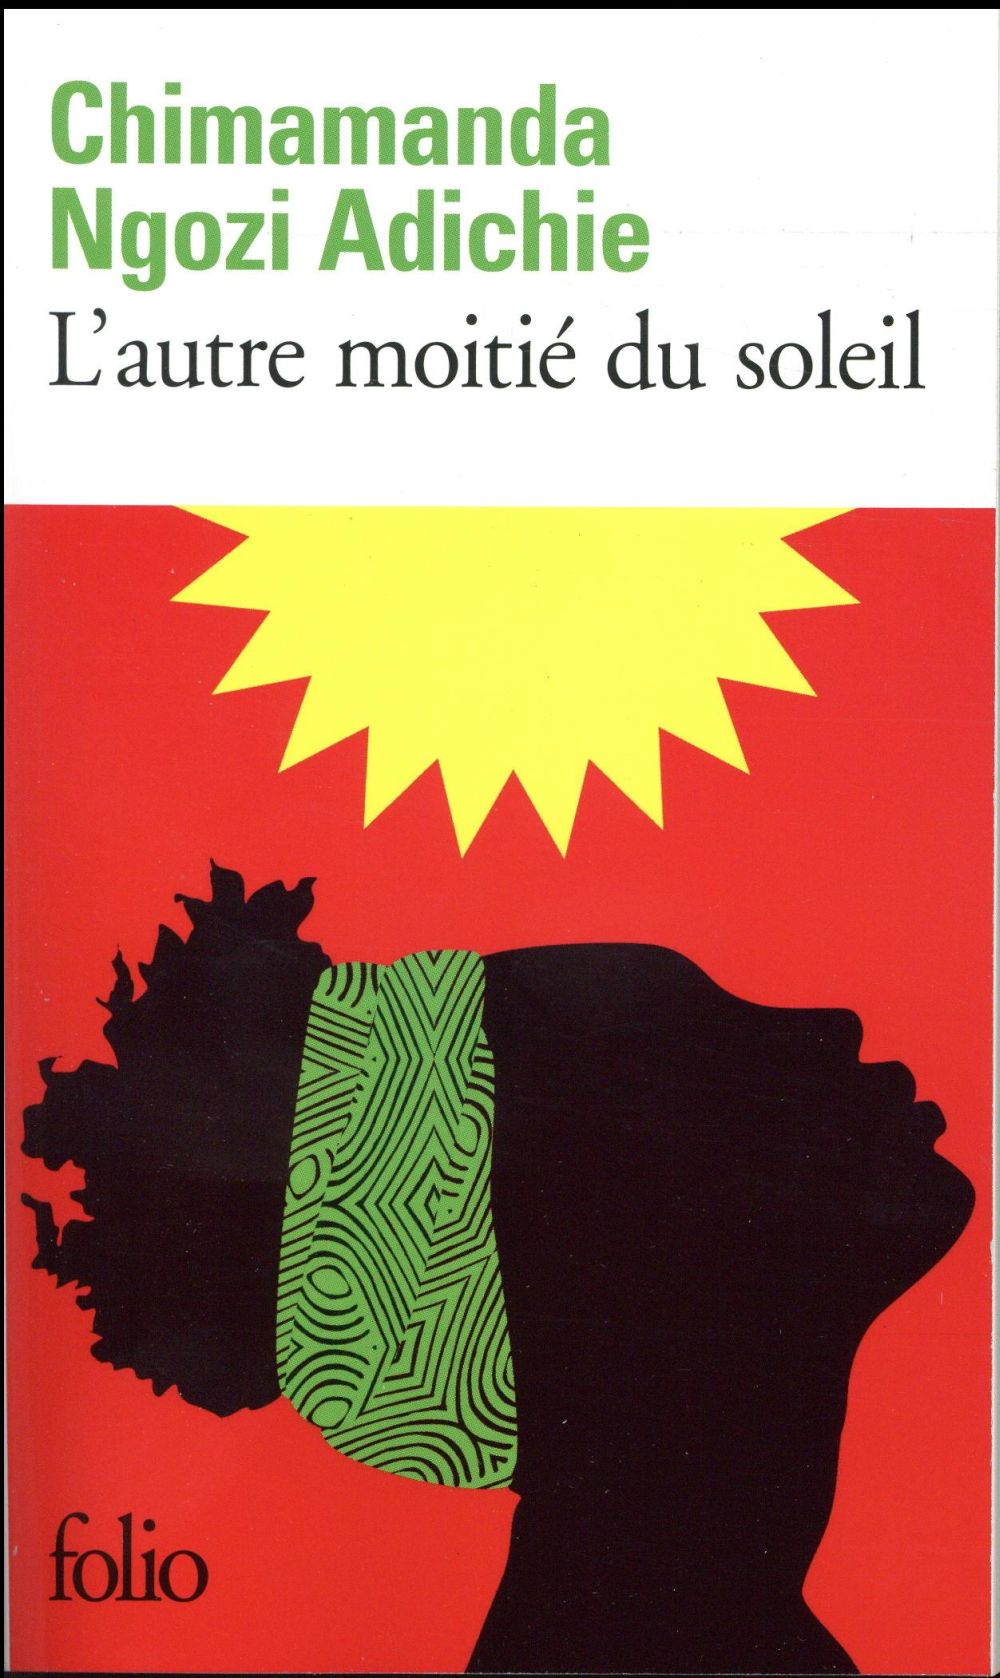 L'AUTRE MOITIE DU SOLEIL Adichie Chimamanda Ngozi Gallimard